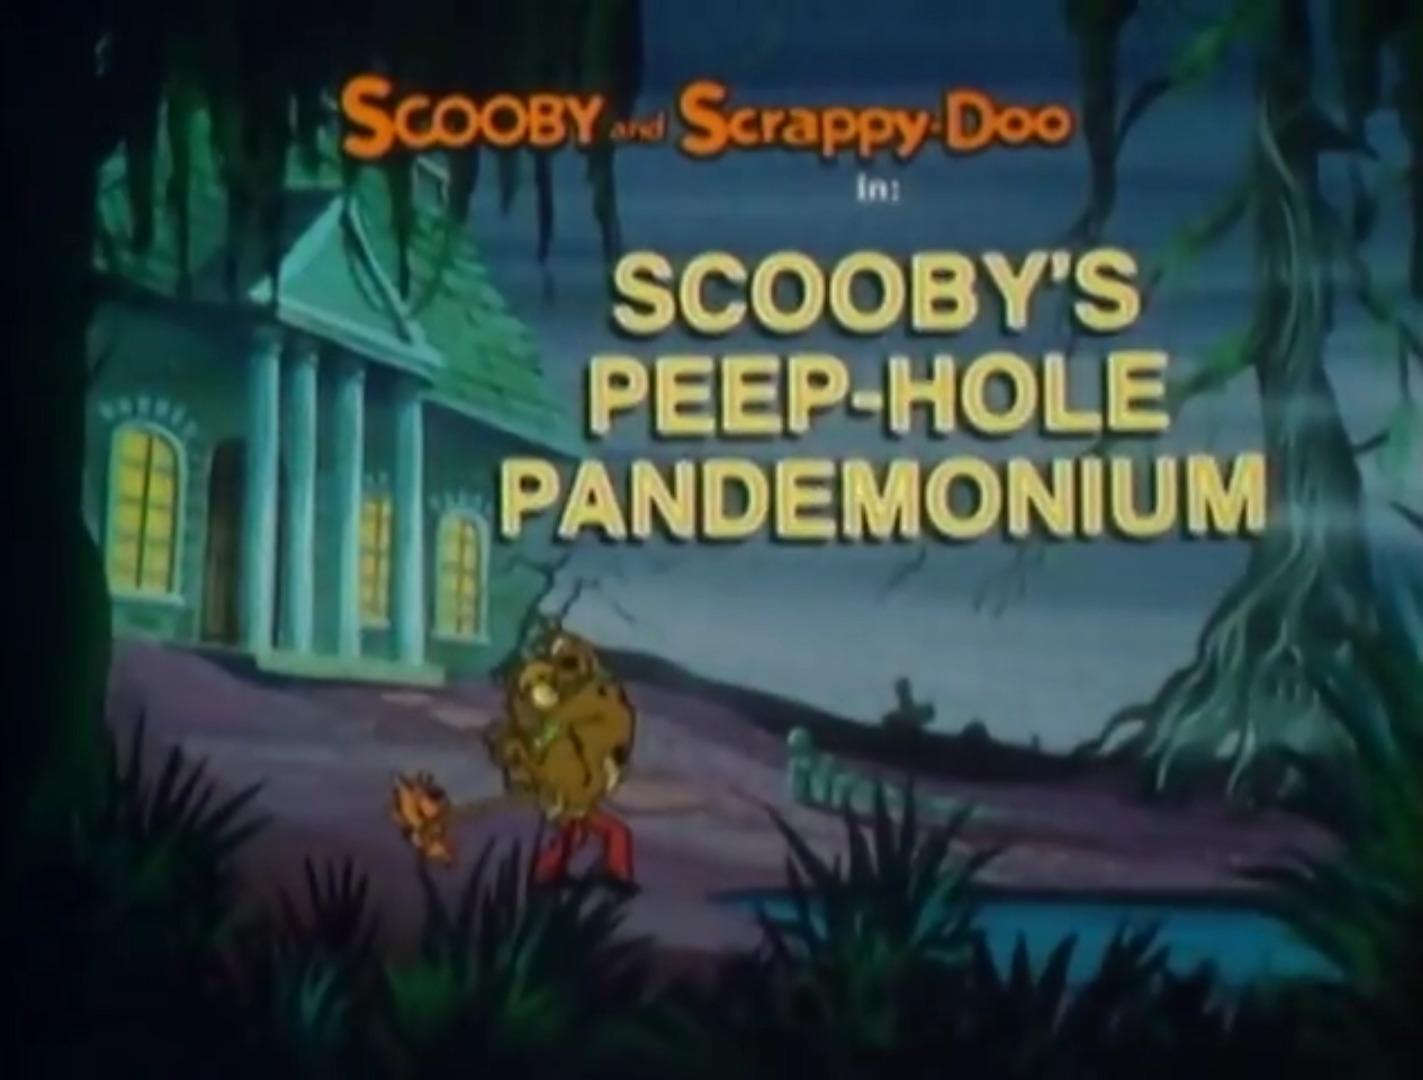 File:Scooby's Peep-Hole Pandemonium title card.jpg